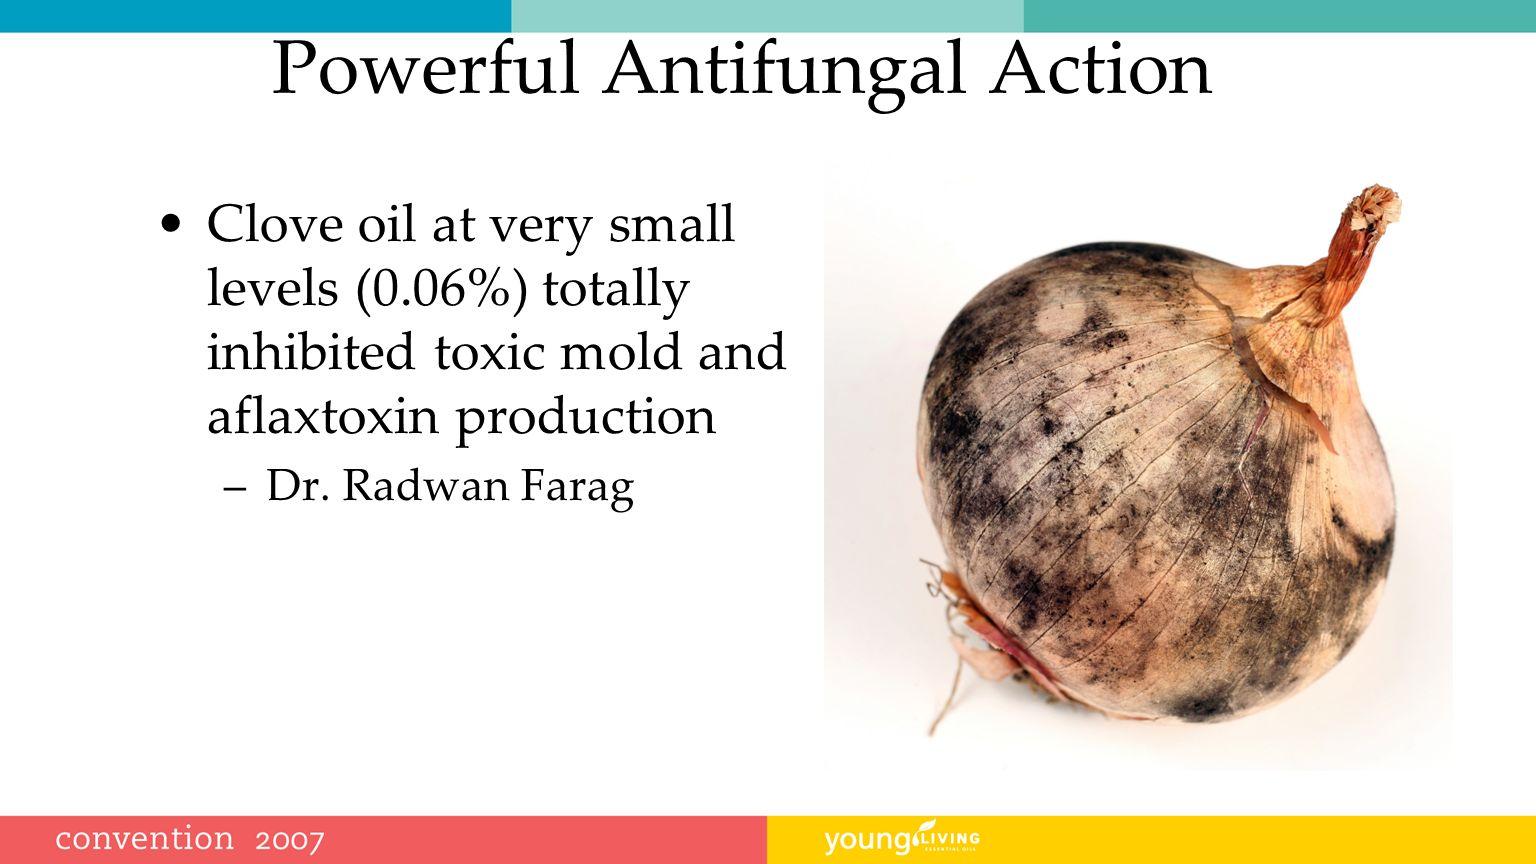 Powerful Antifungal Action